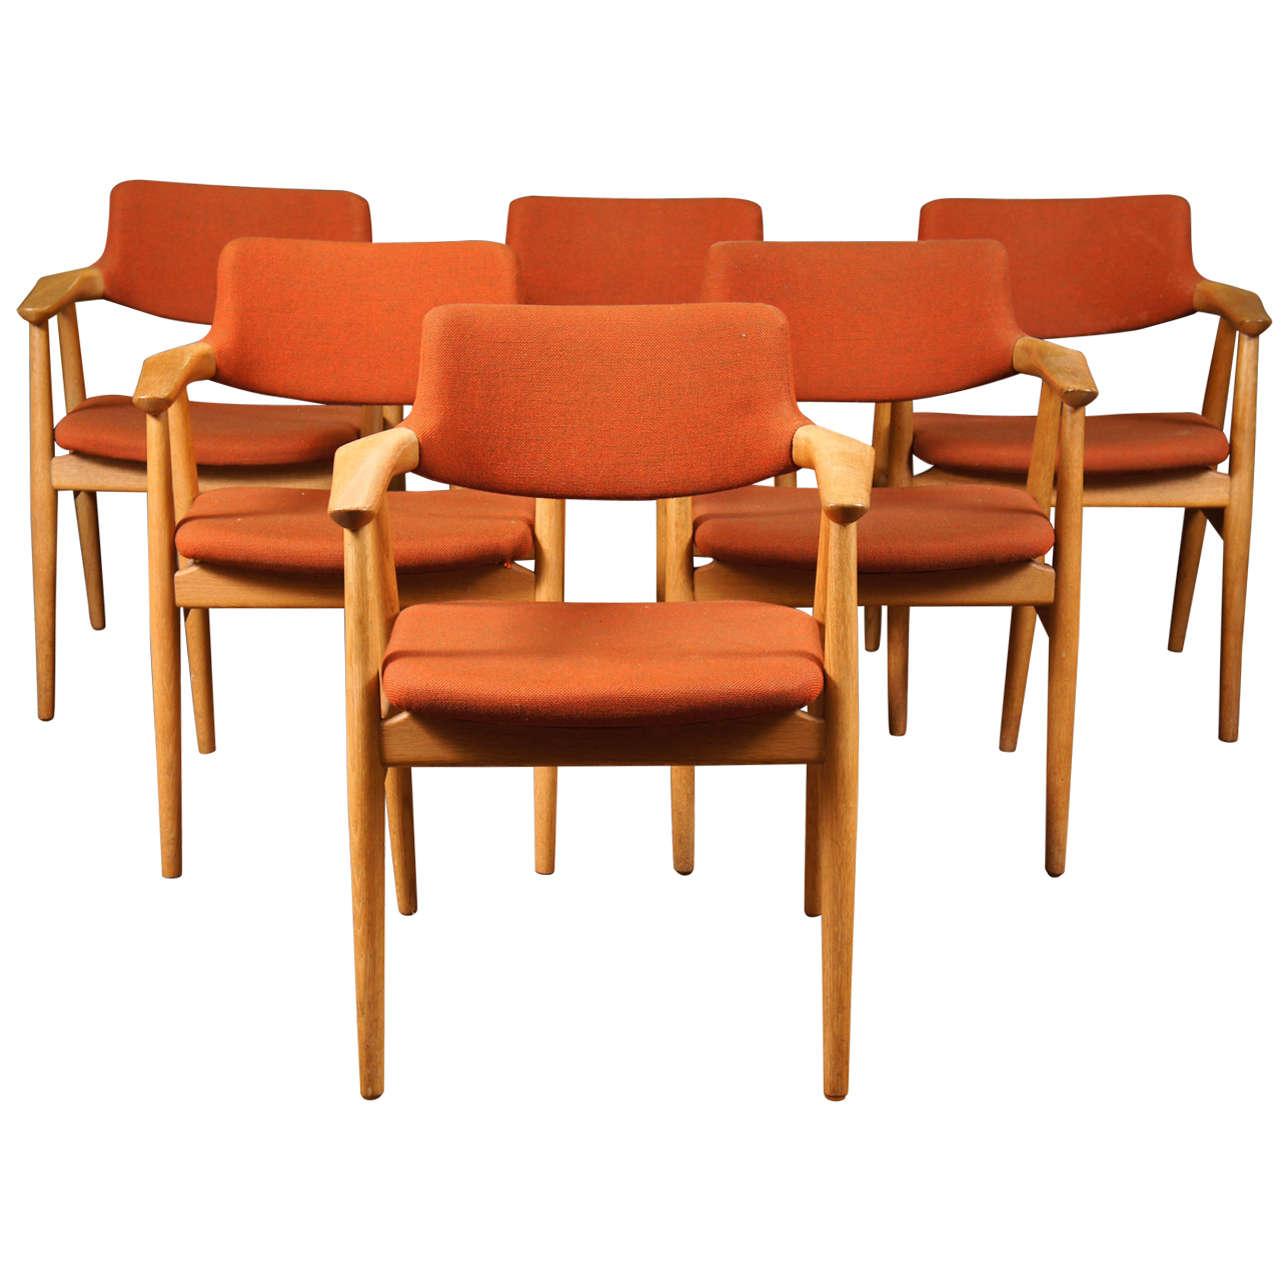 Six Danish Modern Dining Chairs By Erik Kirkegaard At 1stdibs